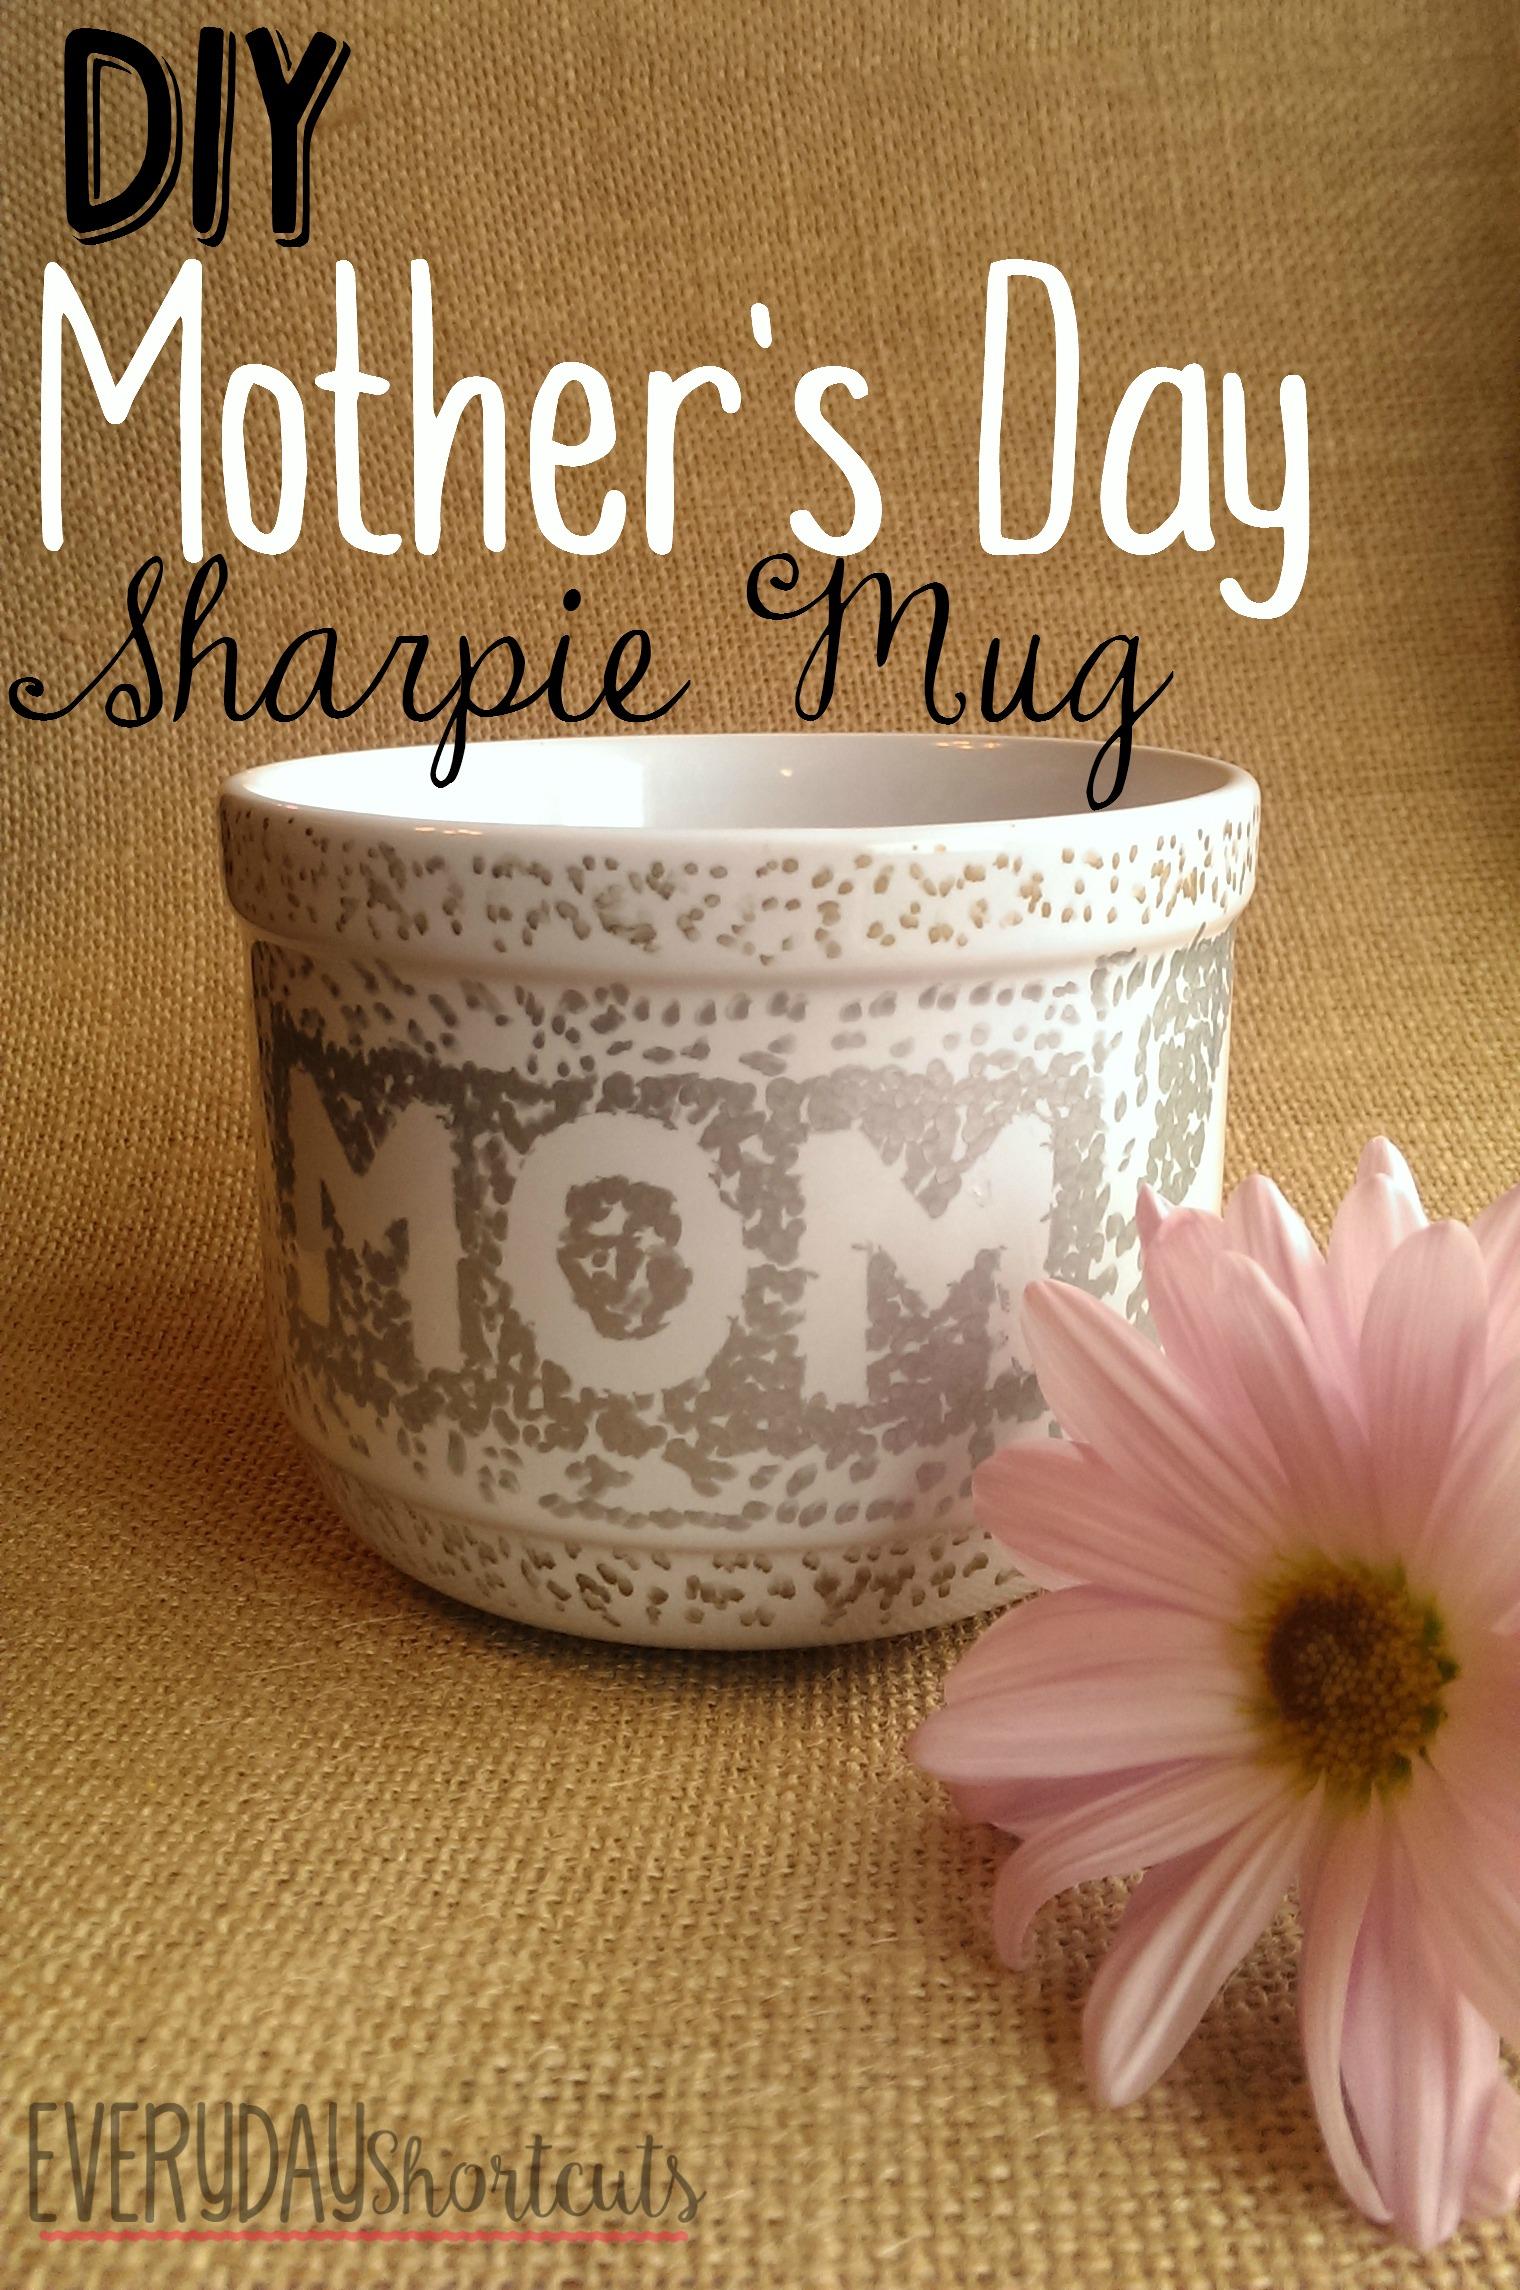 diy-mothers-day-sharpie-mug